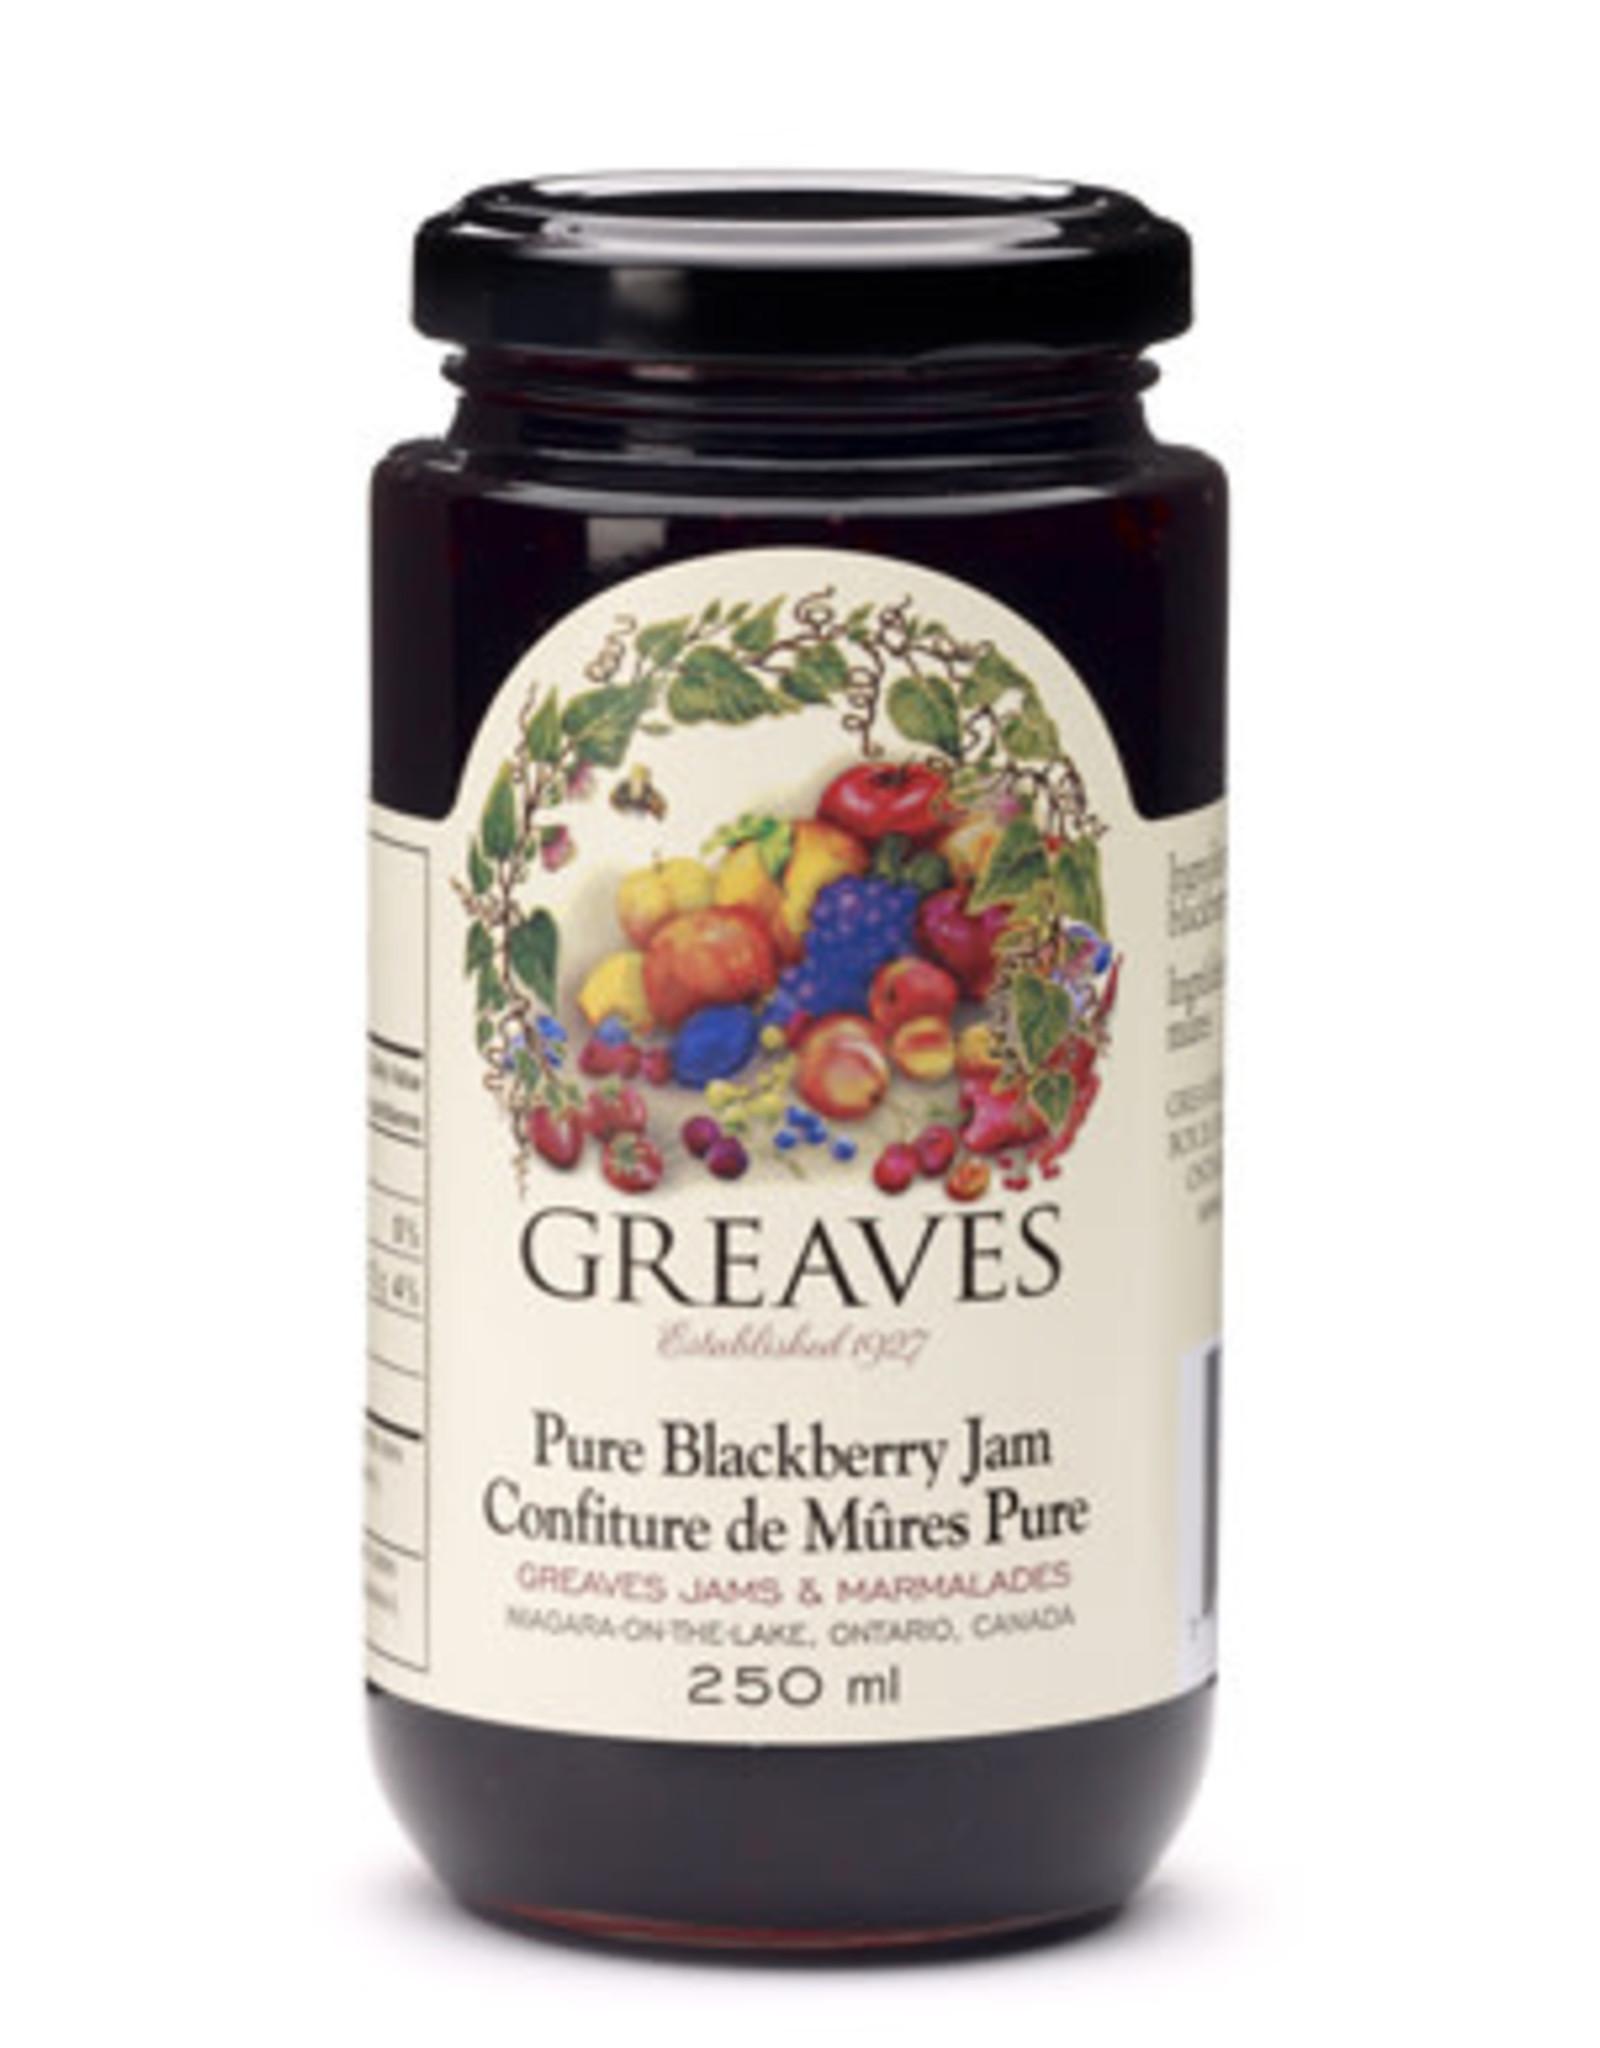 Greaves Jams & Marmalades Ltd. Greaves, Blackberry Jam, 250ml